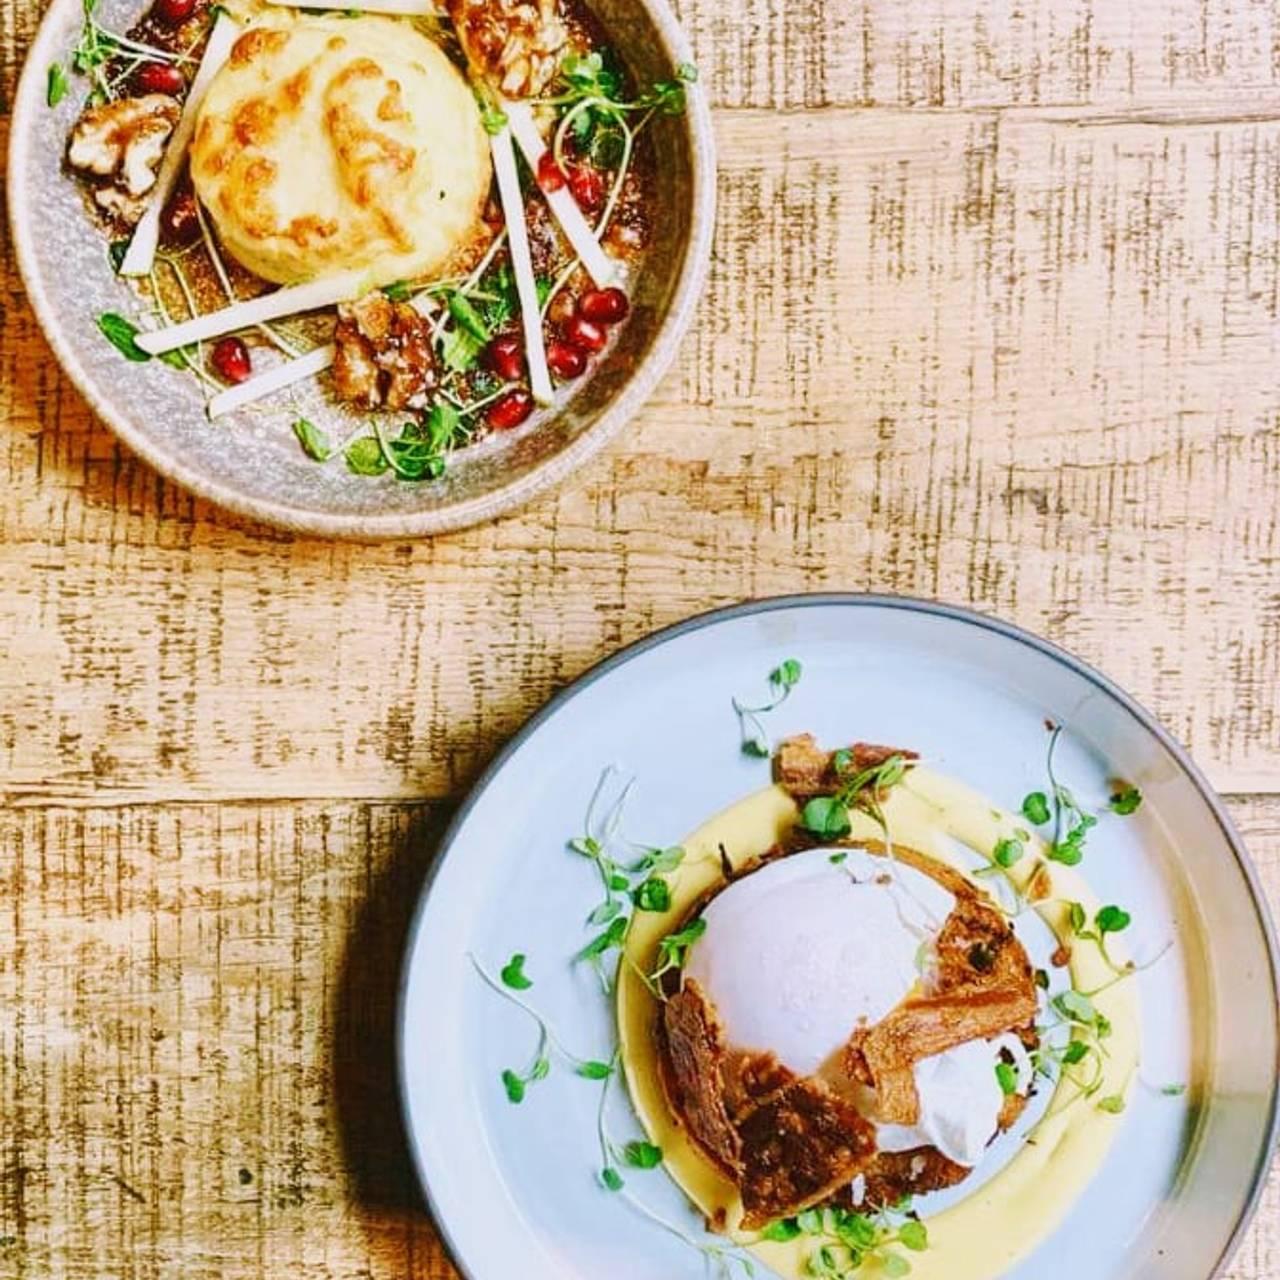 Harmony Cuisine Saint Julien mews brasserie restaurant - london, | opentable